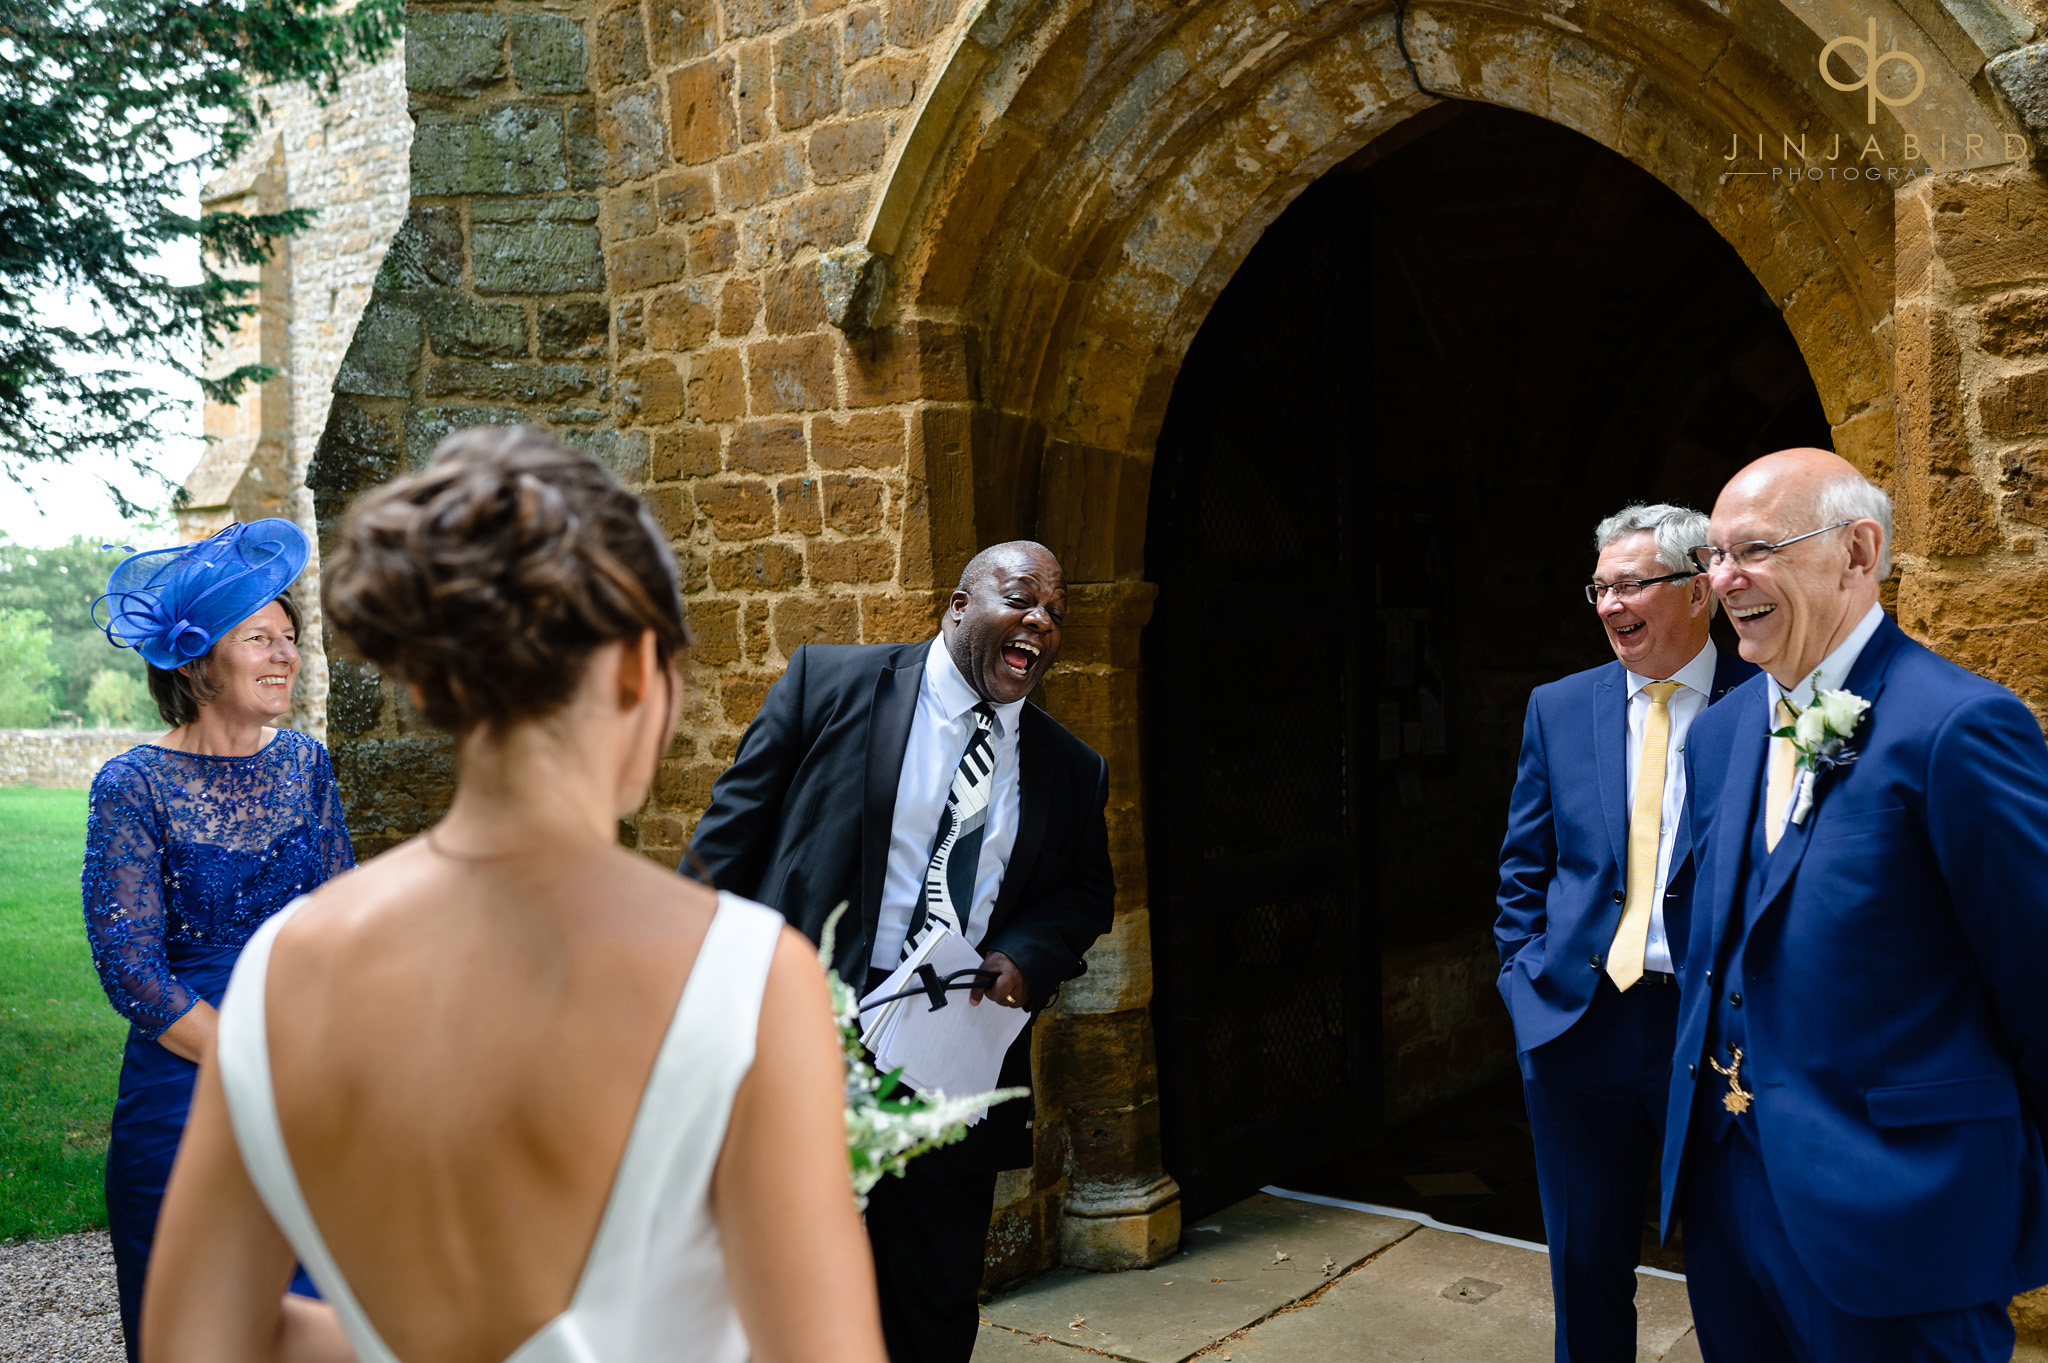 Lincoln noel at wedding dodford